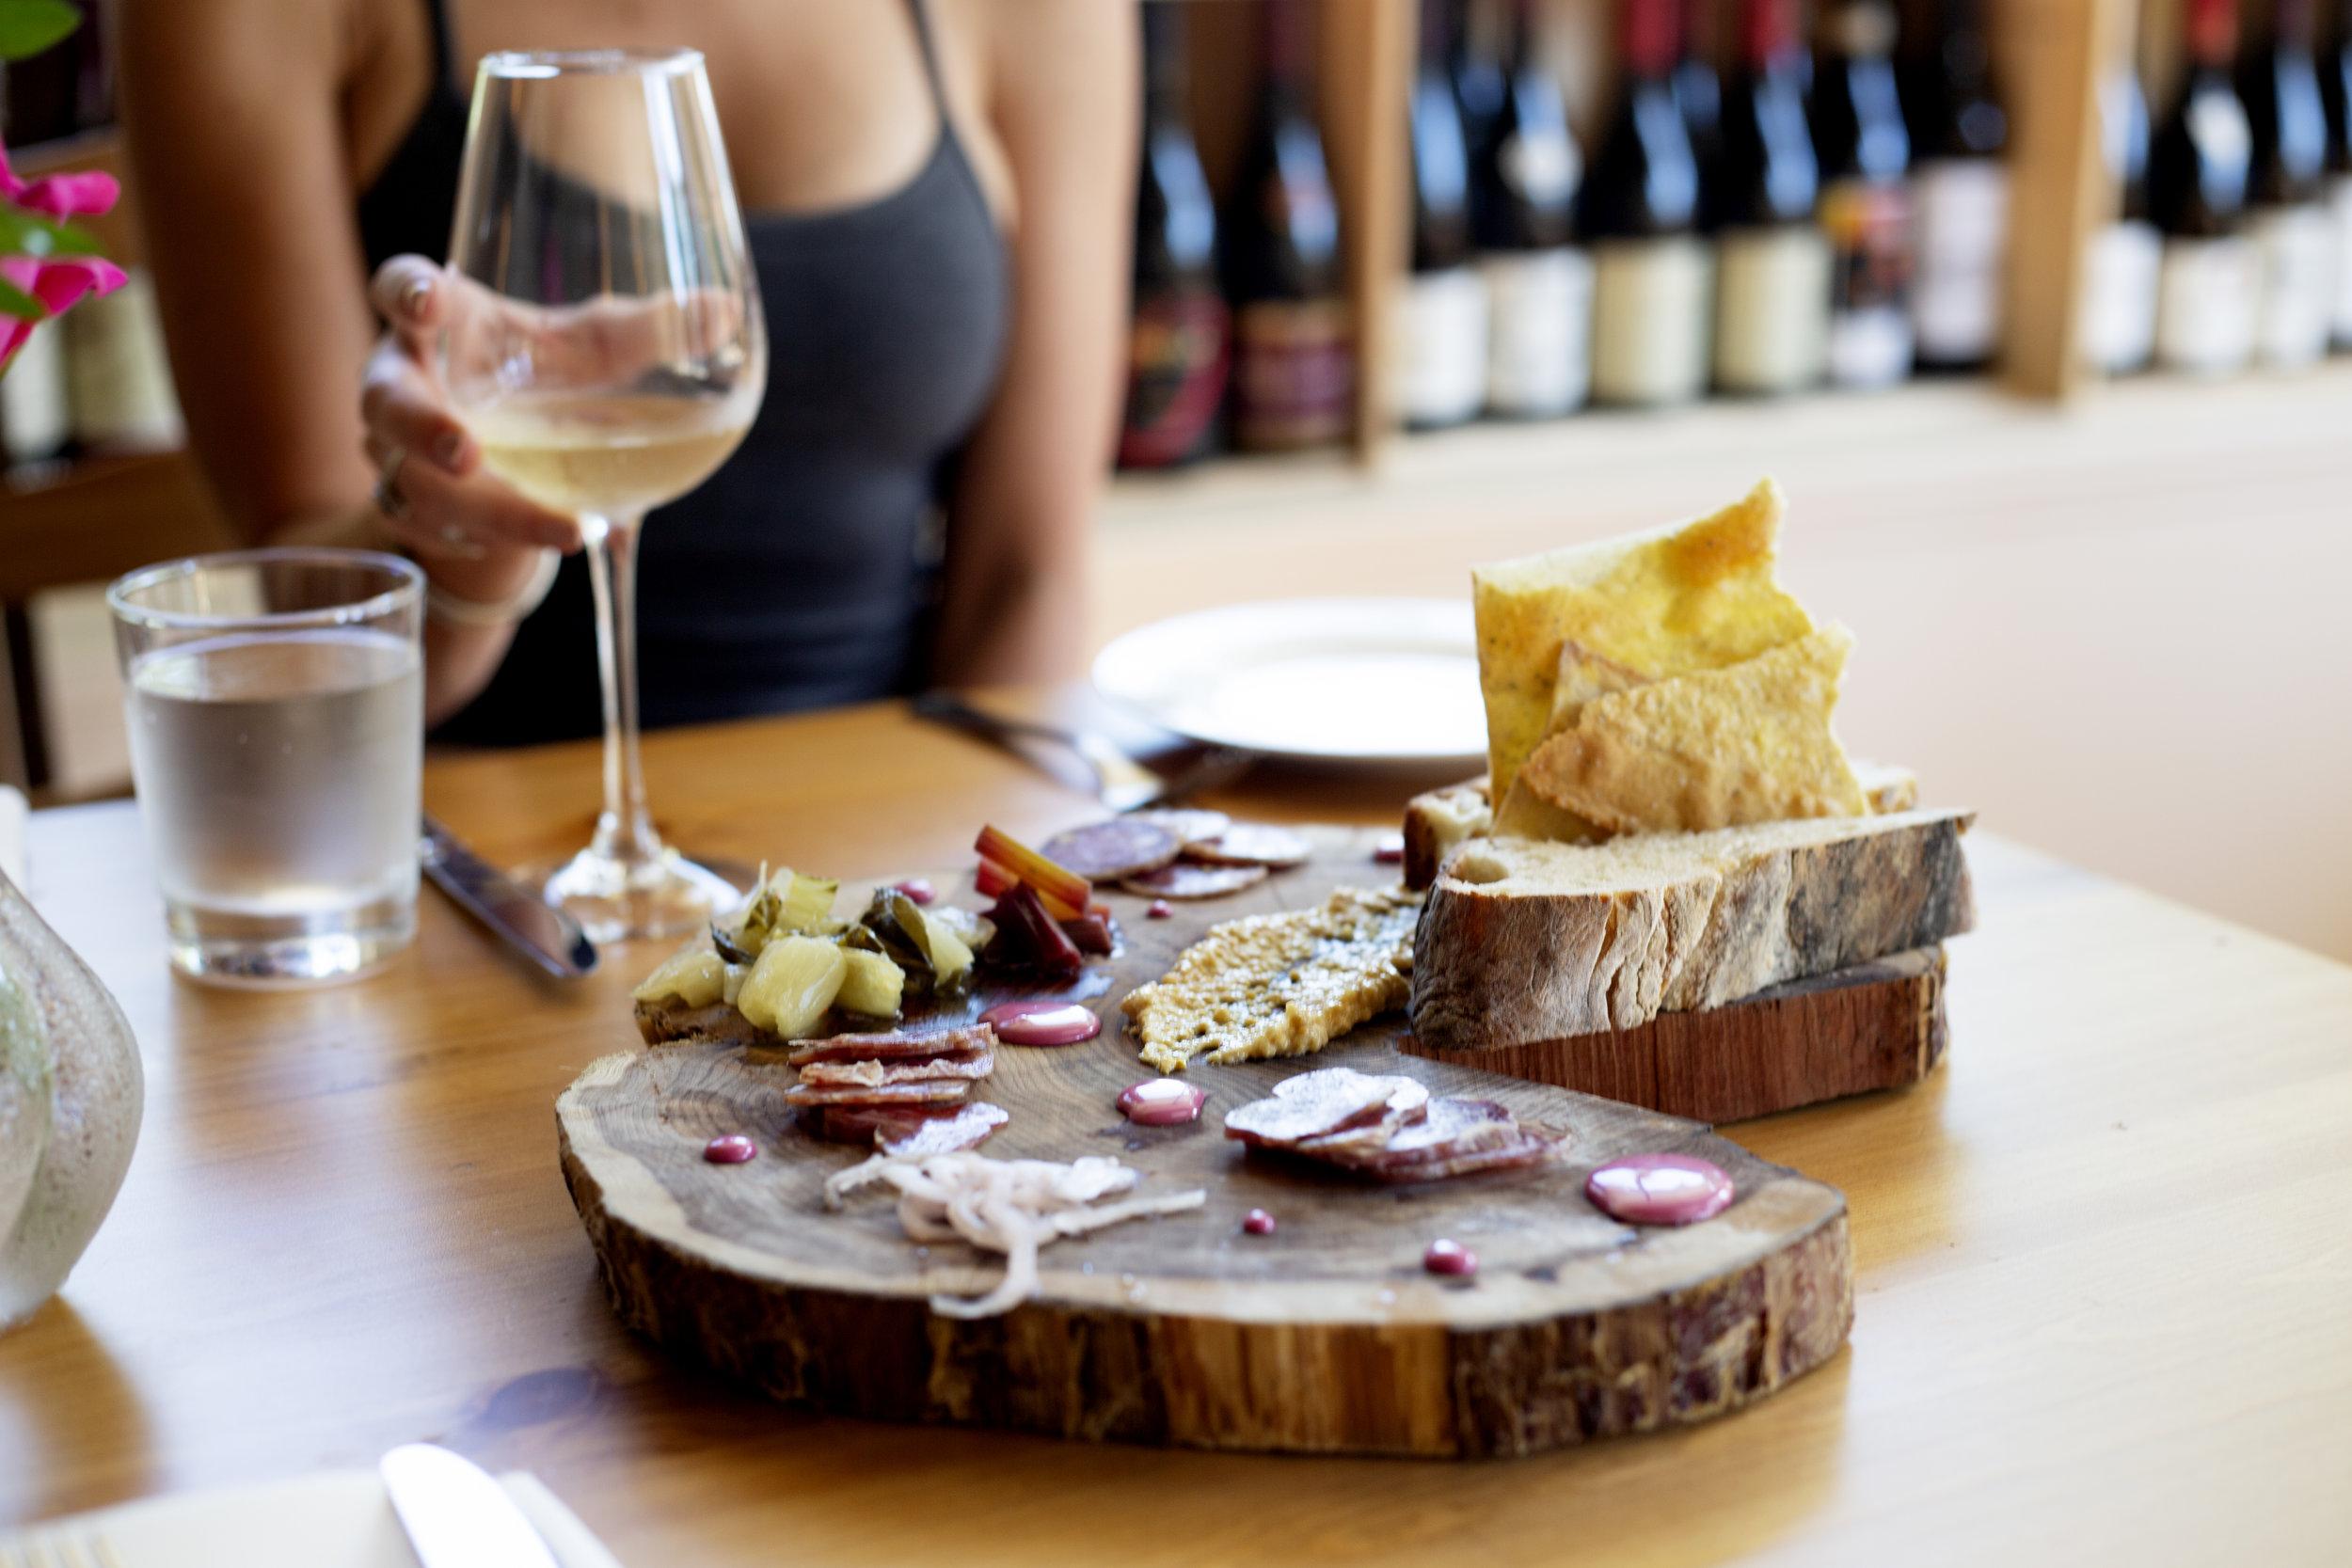 charcuterie and wine.jpg